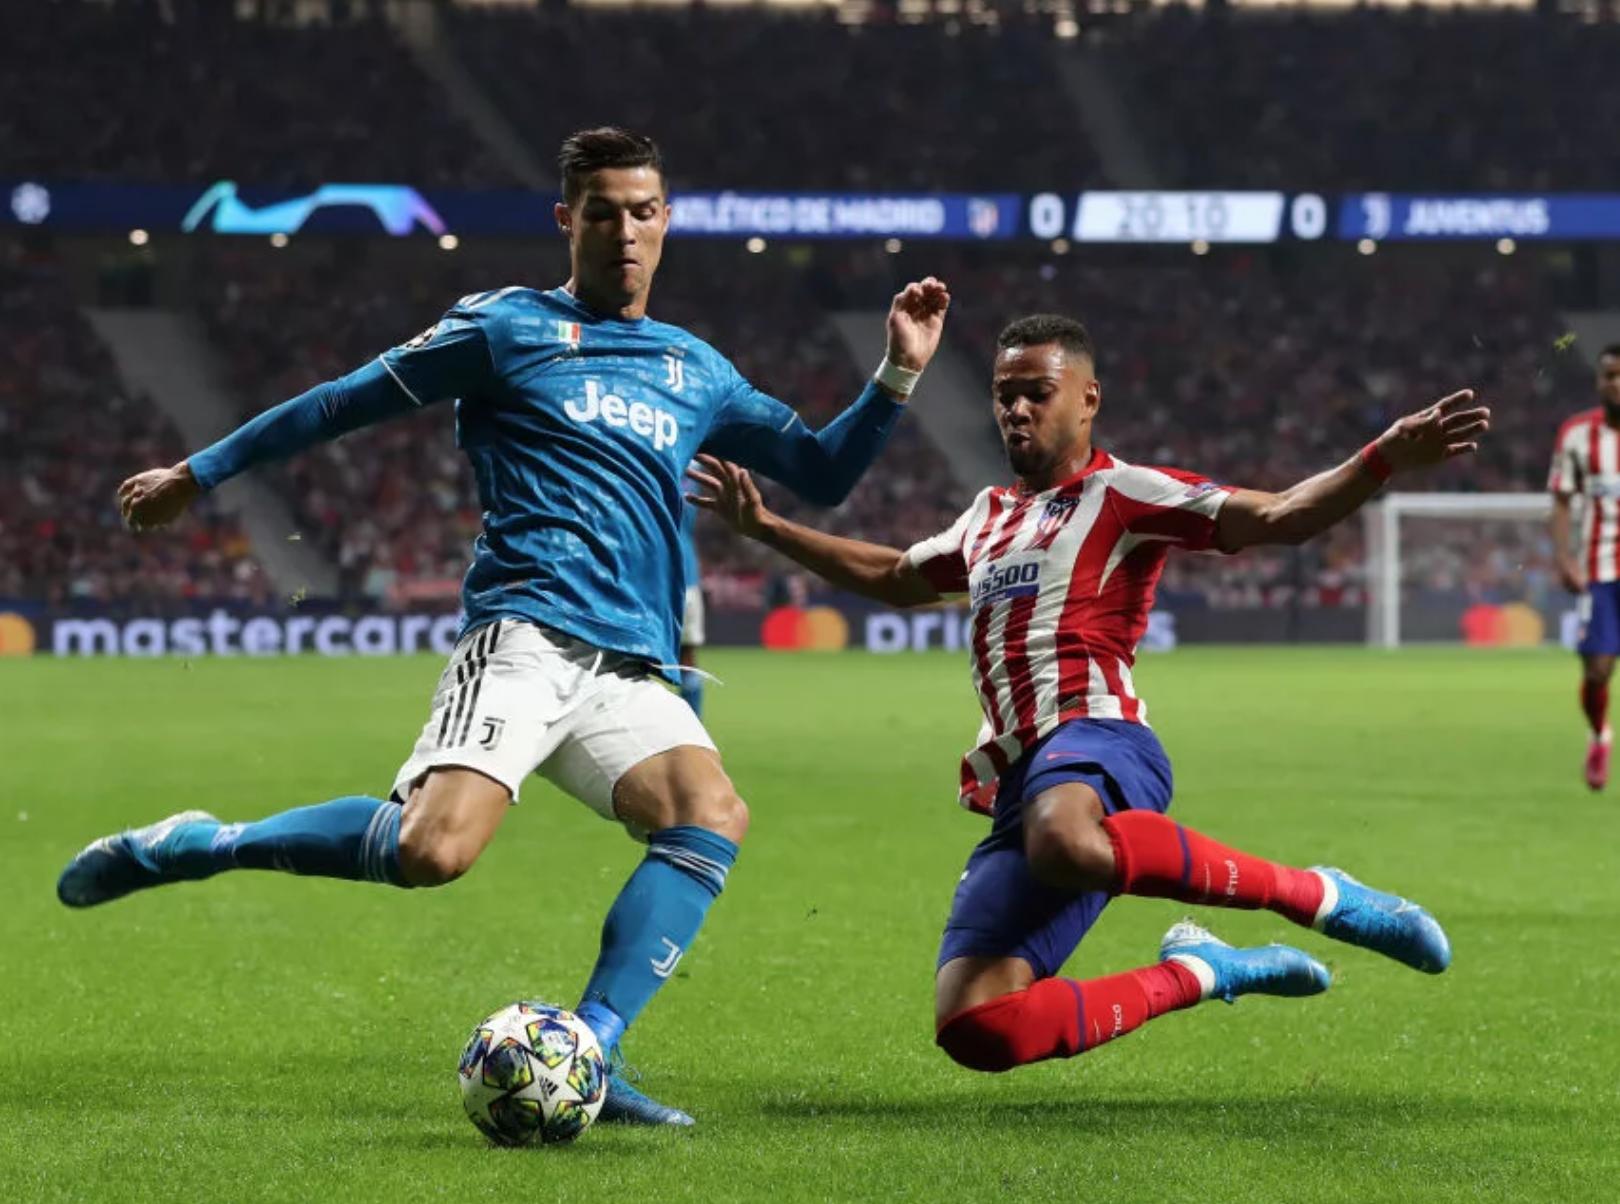 Ювентус - Атлетико Мадрид 26 ноября ставки на матч